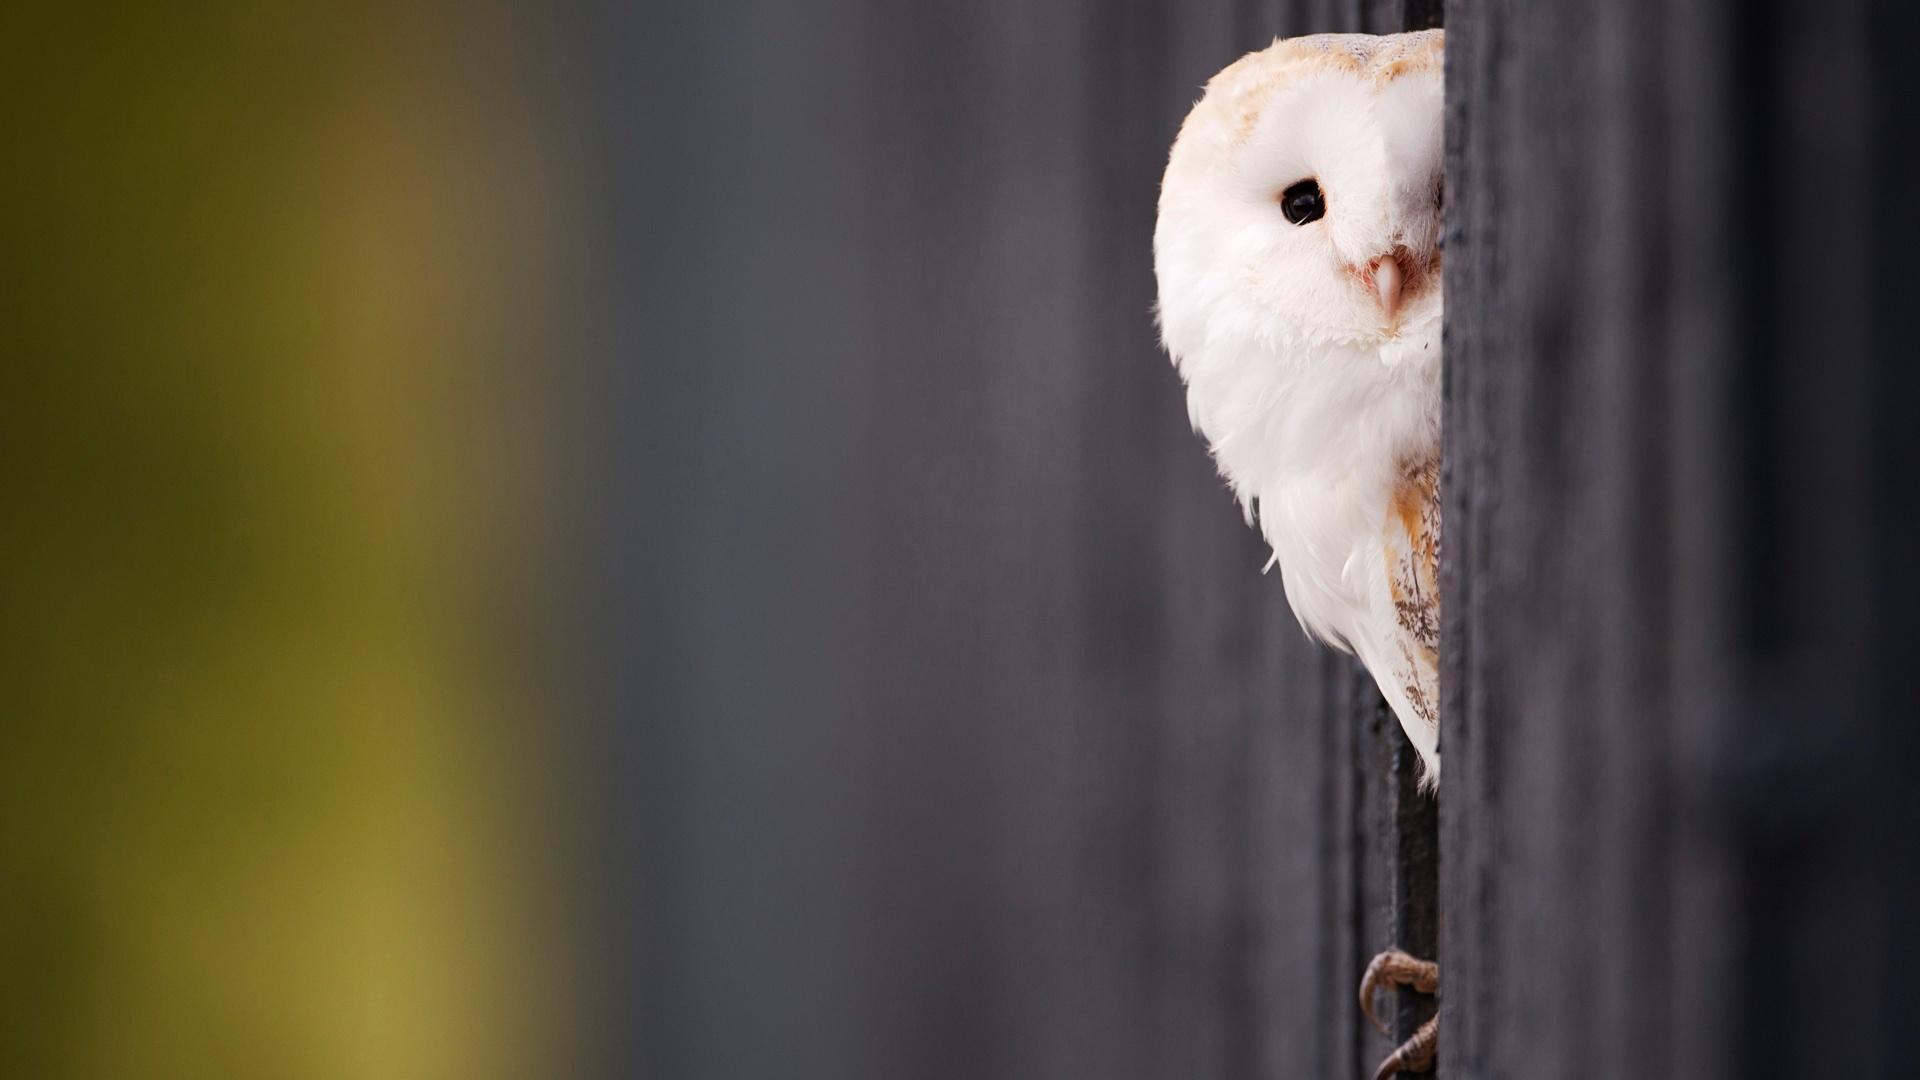 Cute winter owl wallpaper